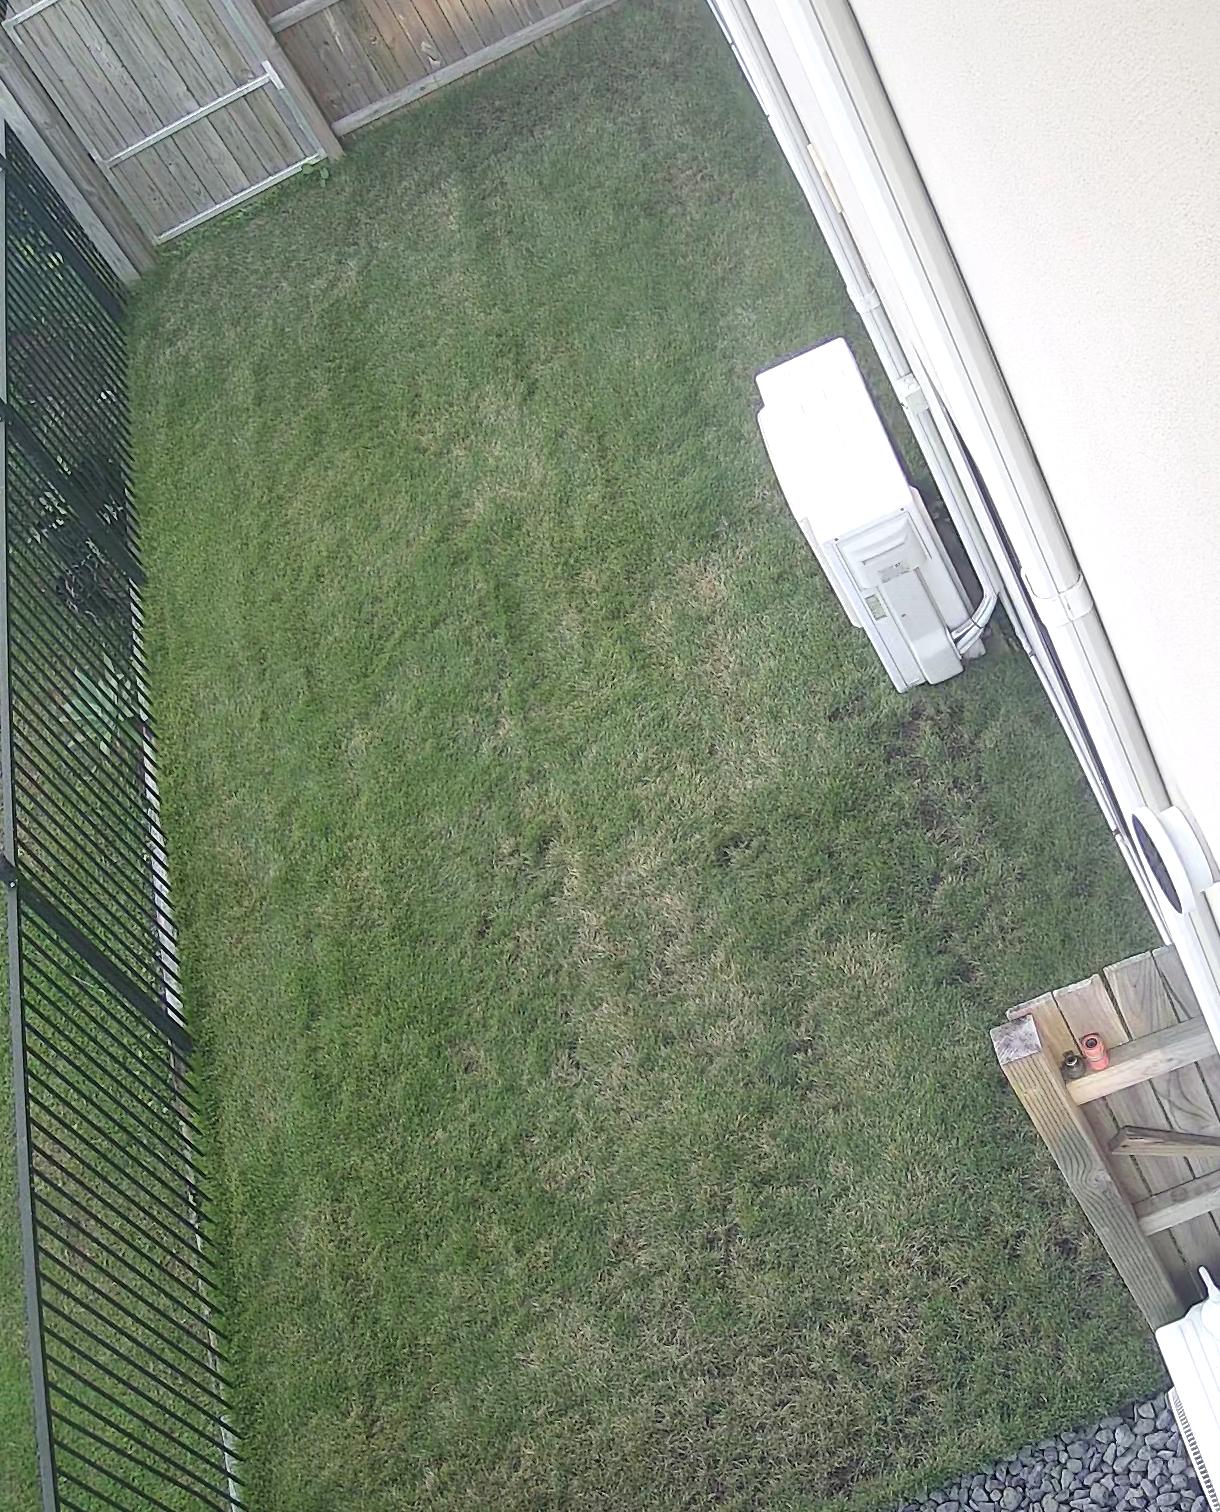 Grass has taken a turn